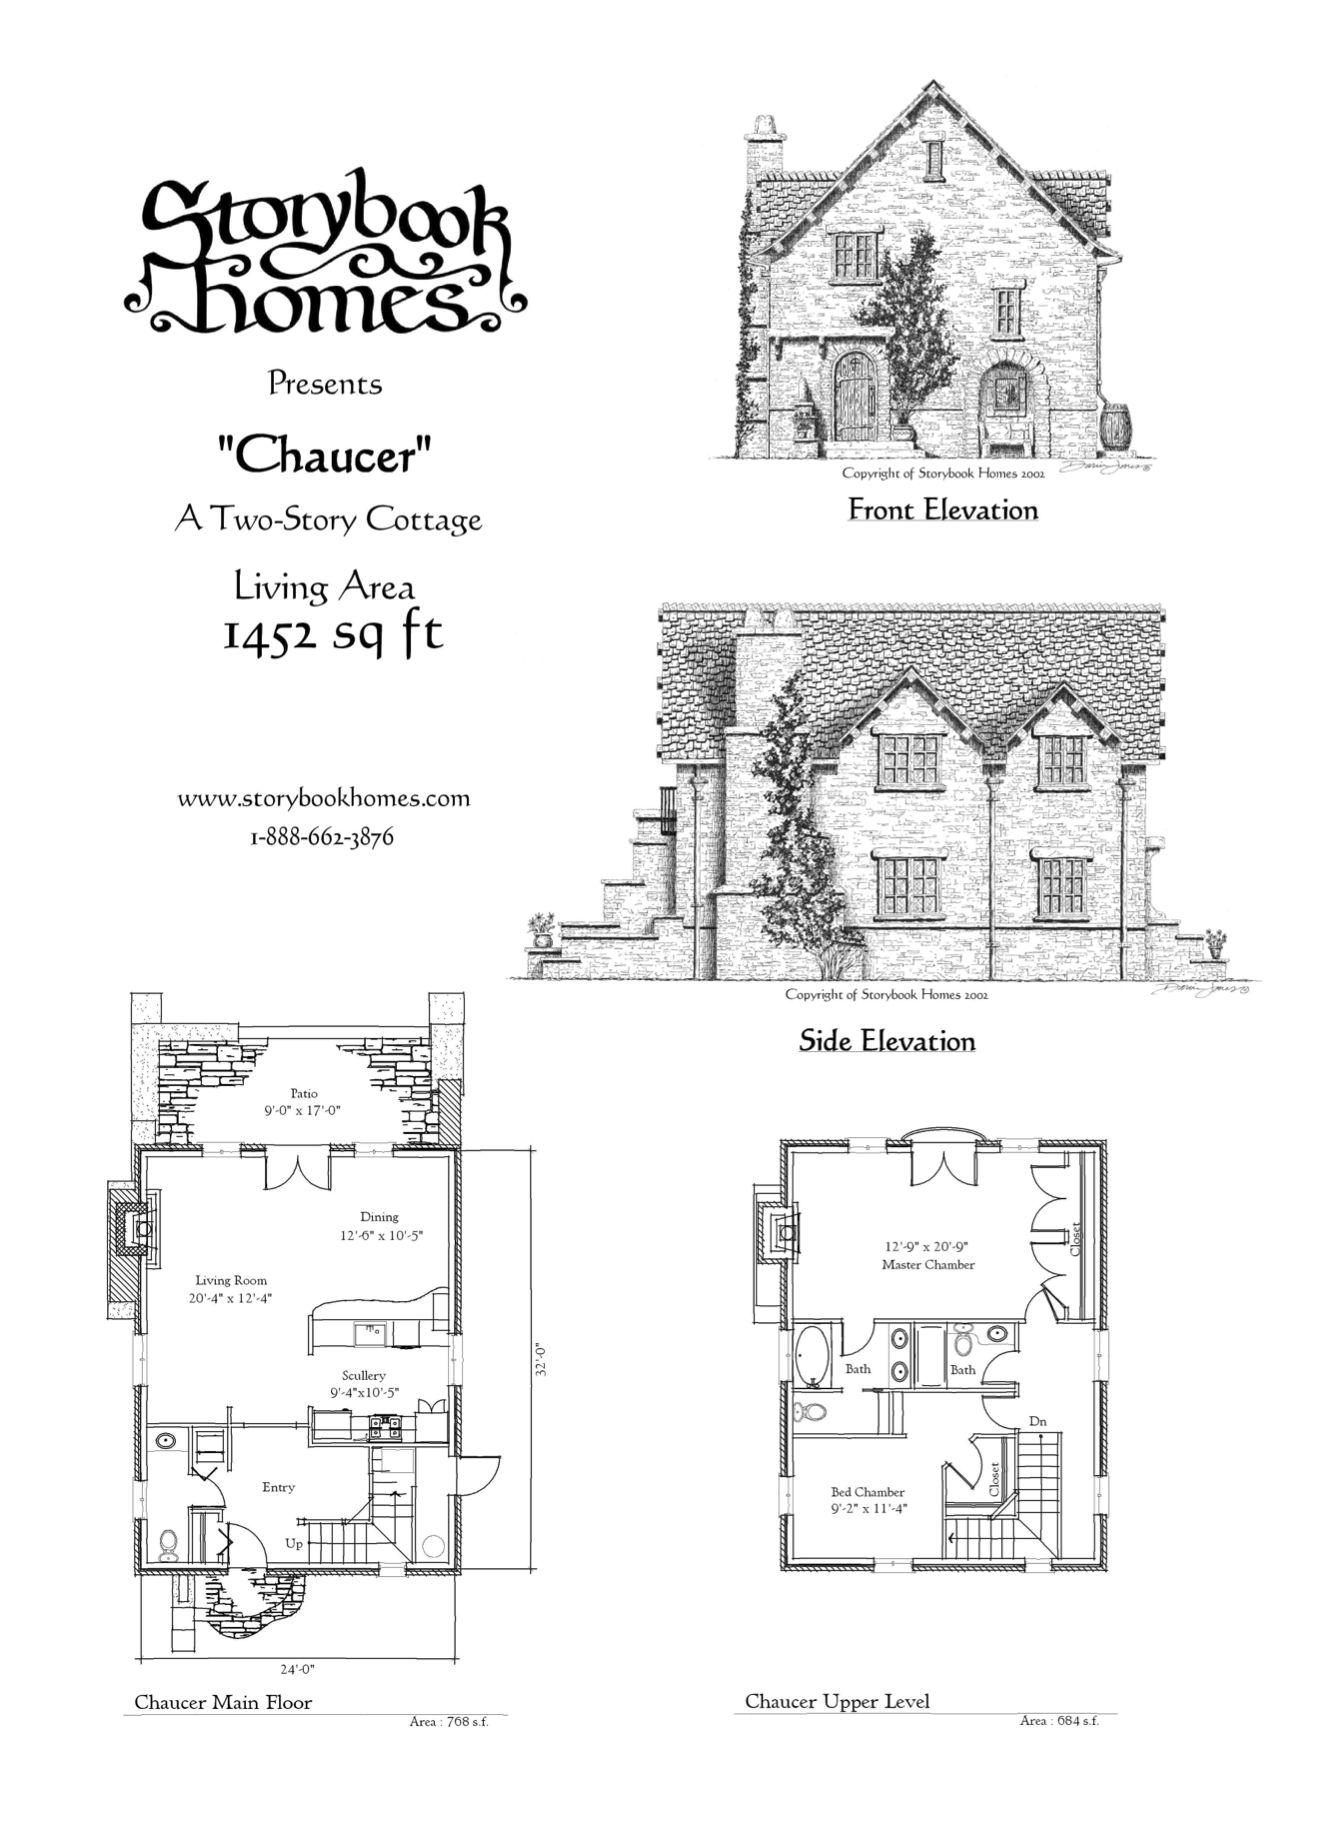 Chaucer Houseplan Via Storybook Homes Storybook House Plan